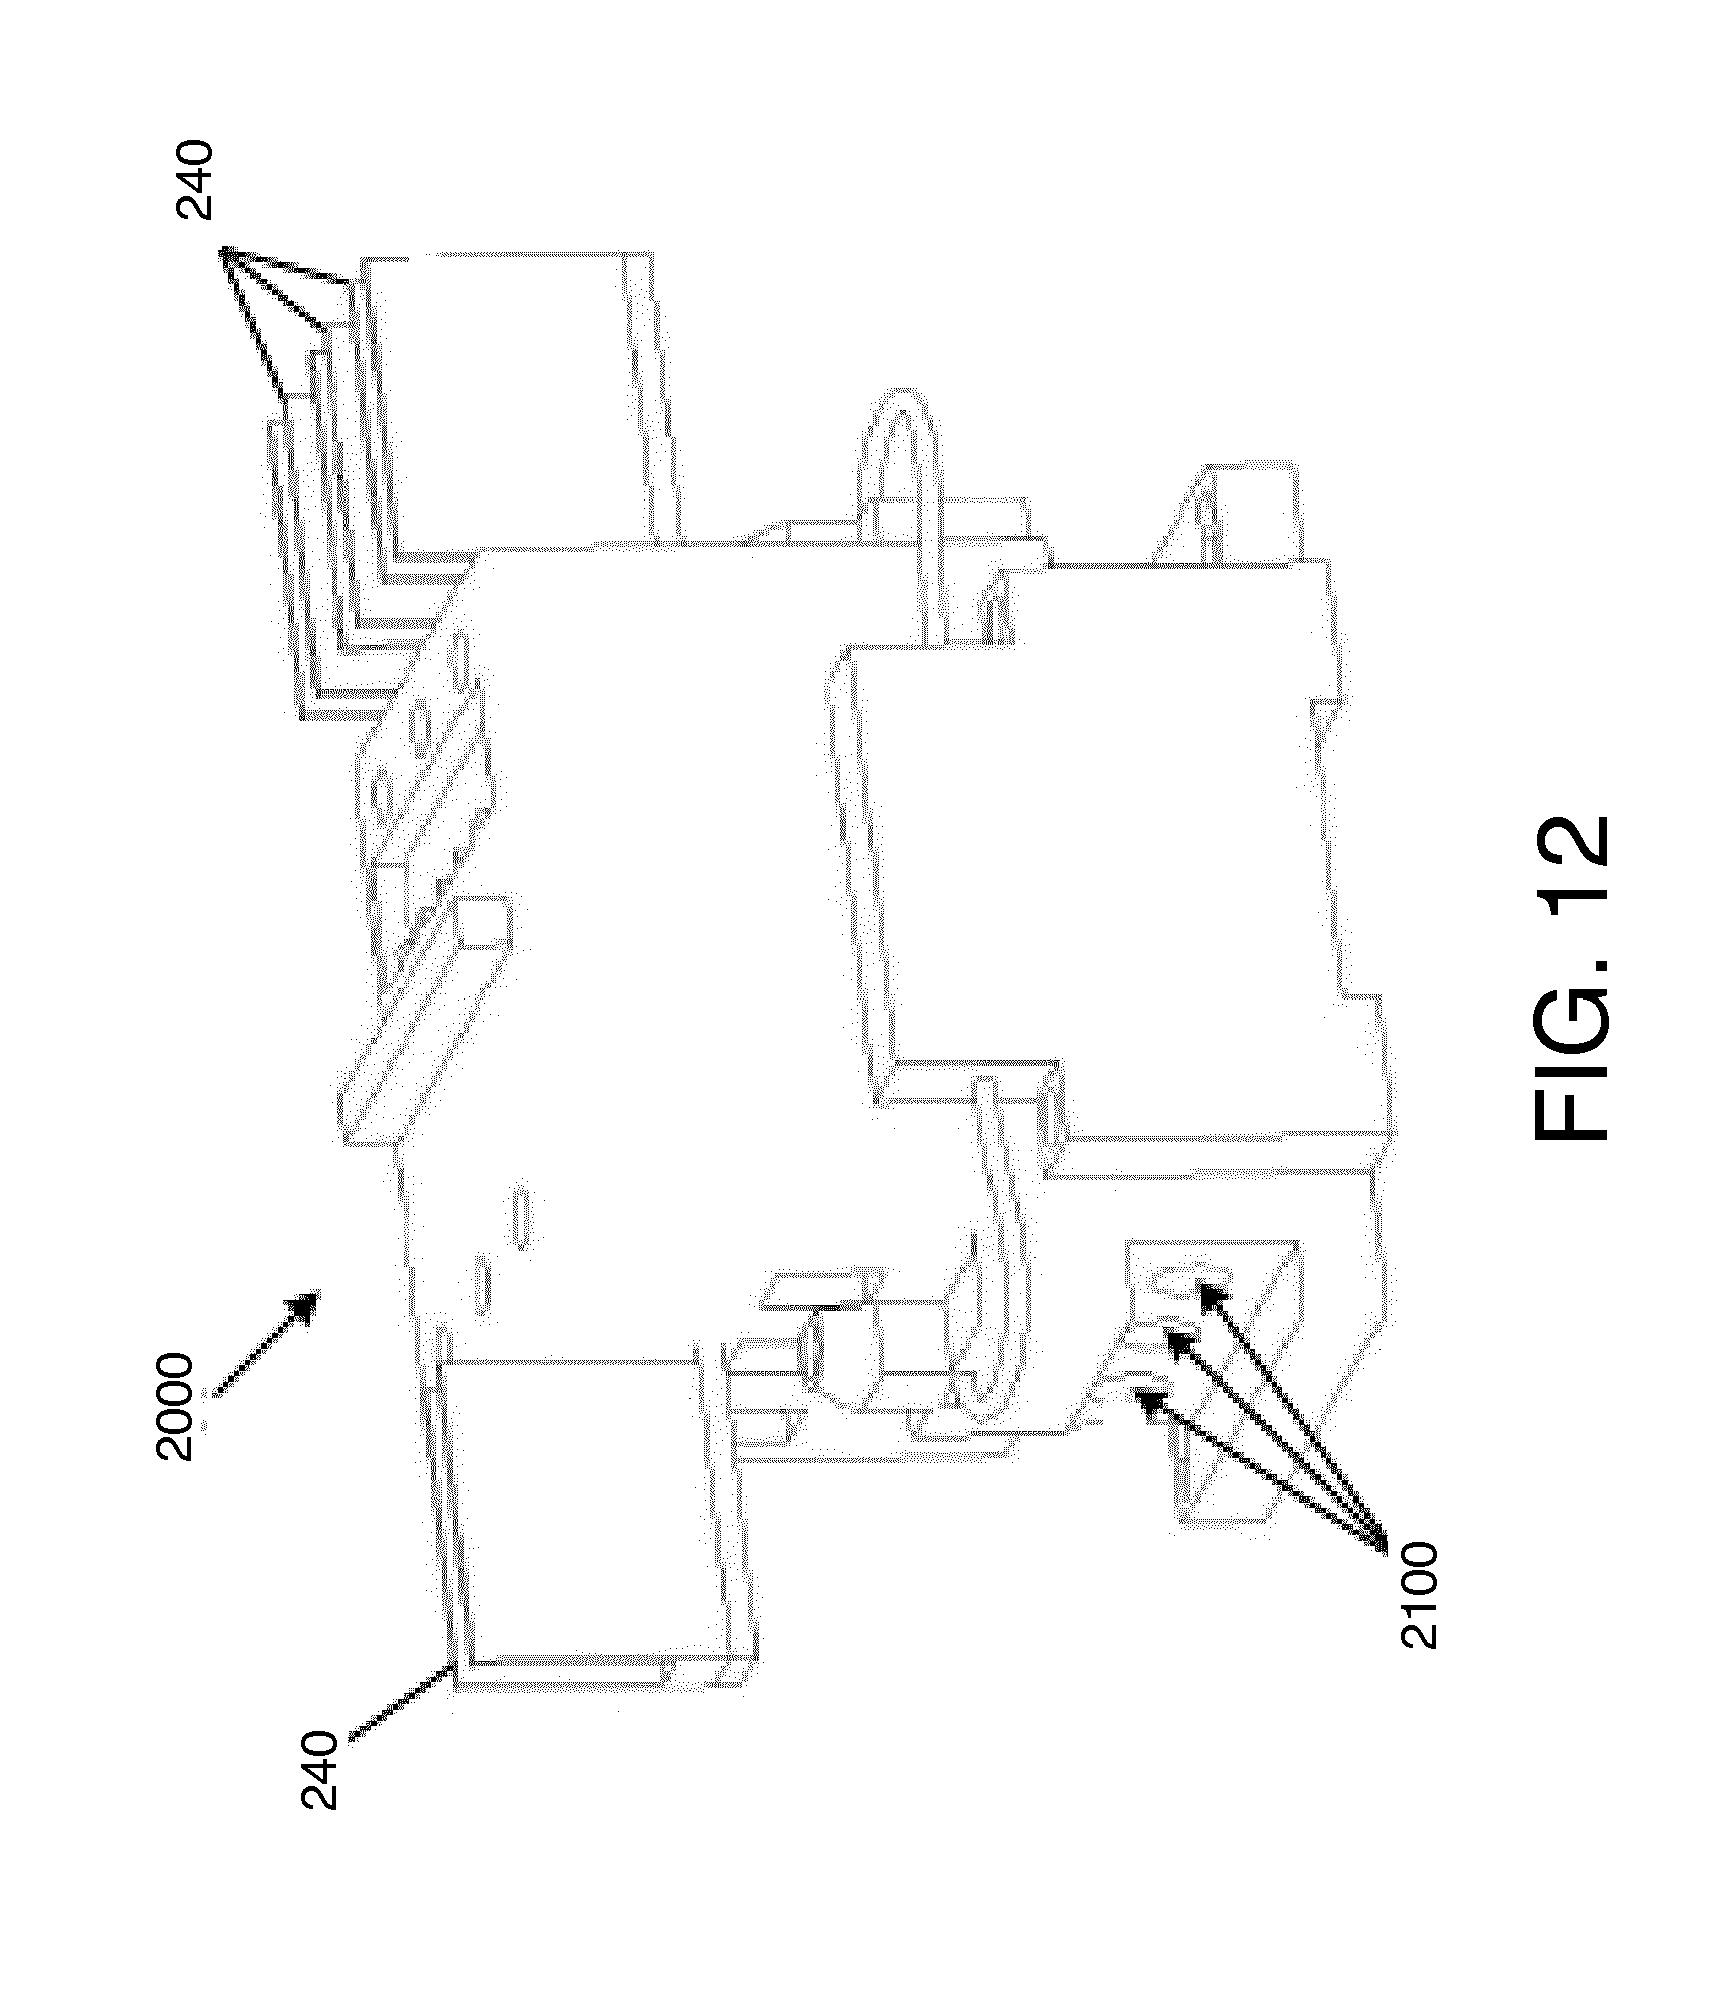 patent ep2747116a1